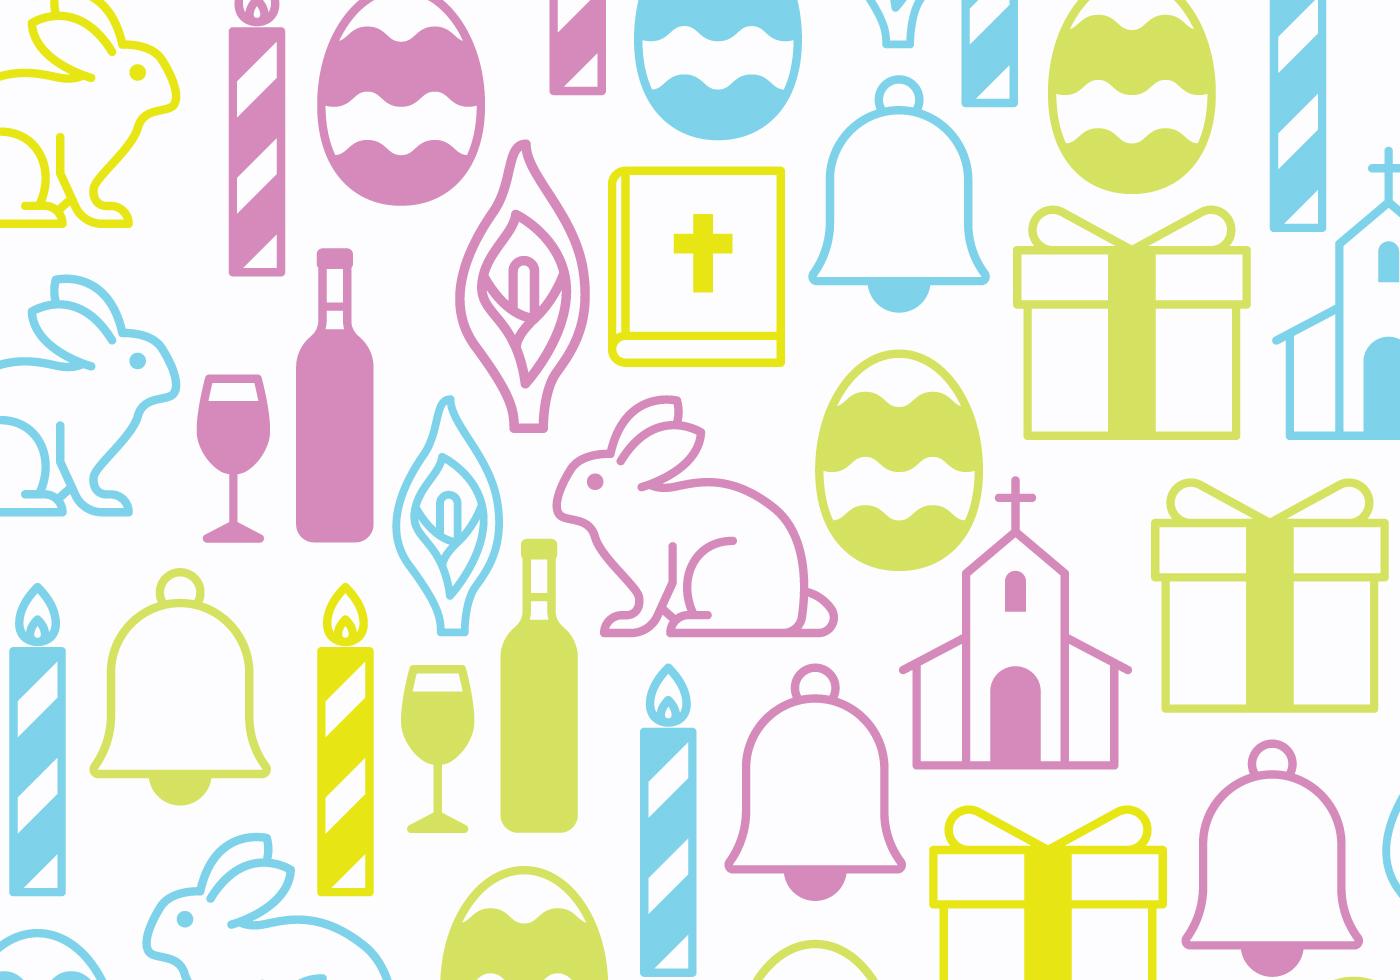 Christian fish symbol free vector art 31525 free downloads easter symbols biocorpaavc